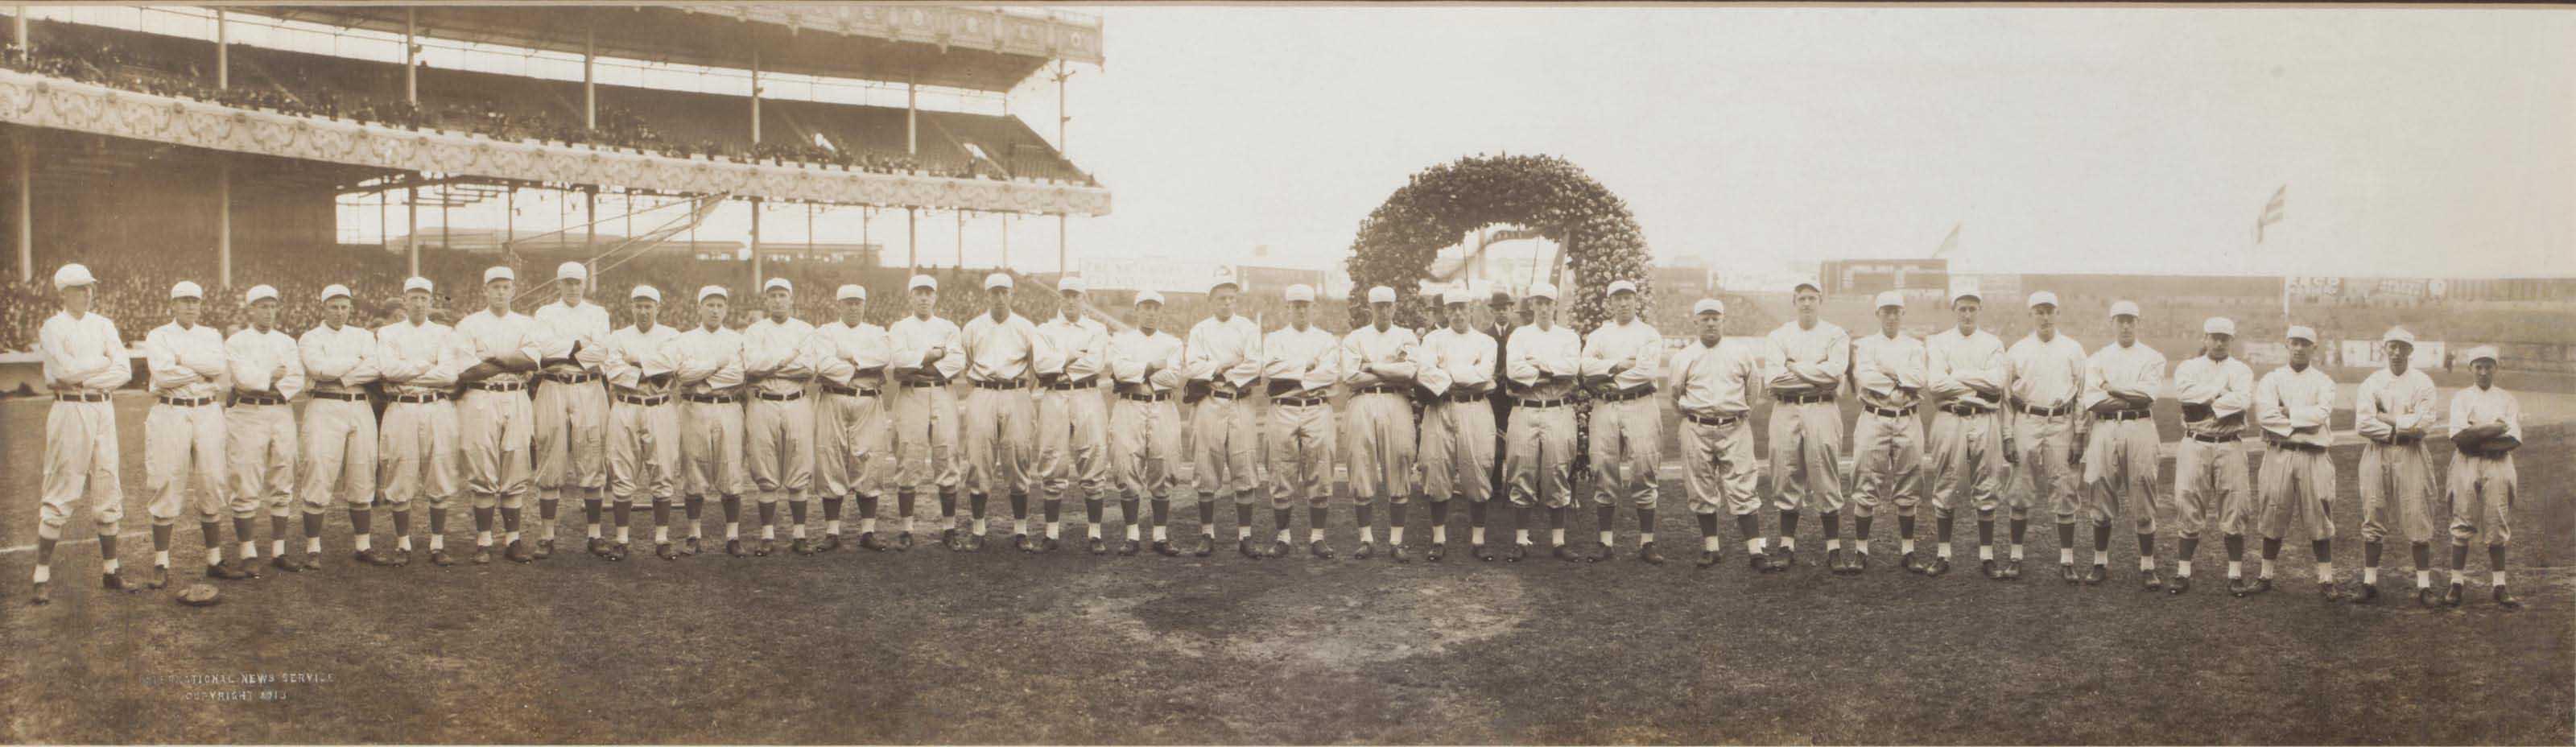 1913 NEW YORK GIANTS TEAM PANO